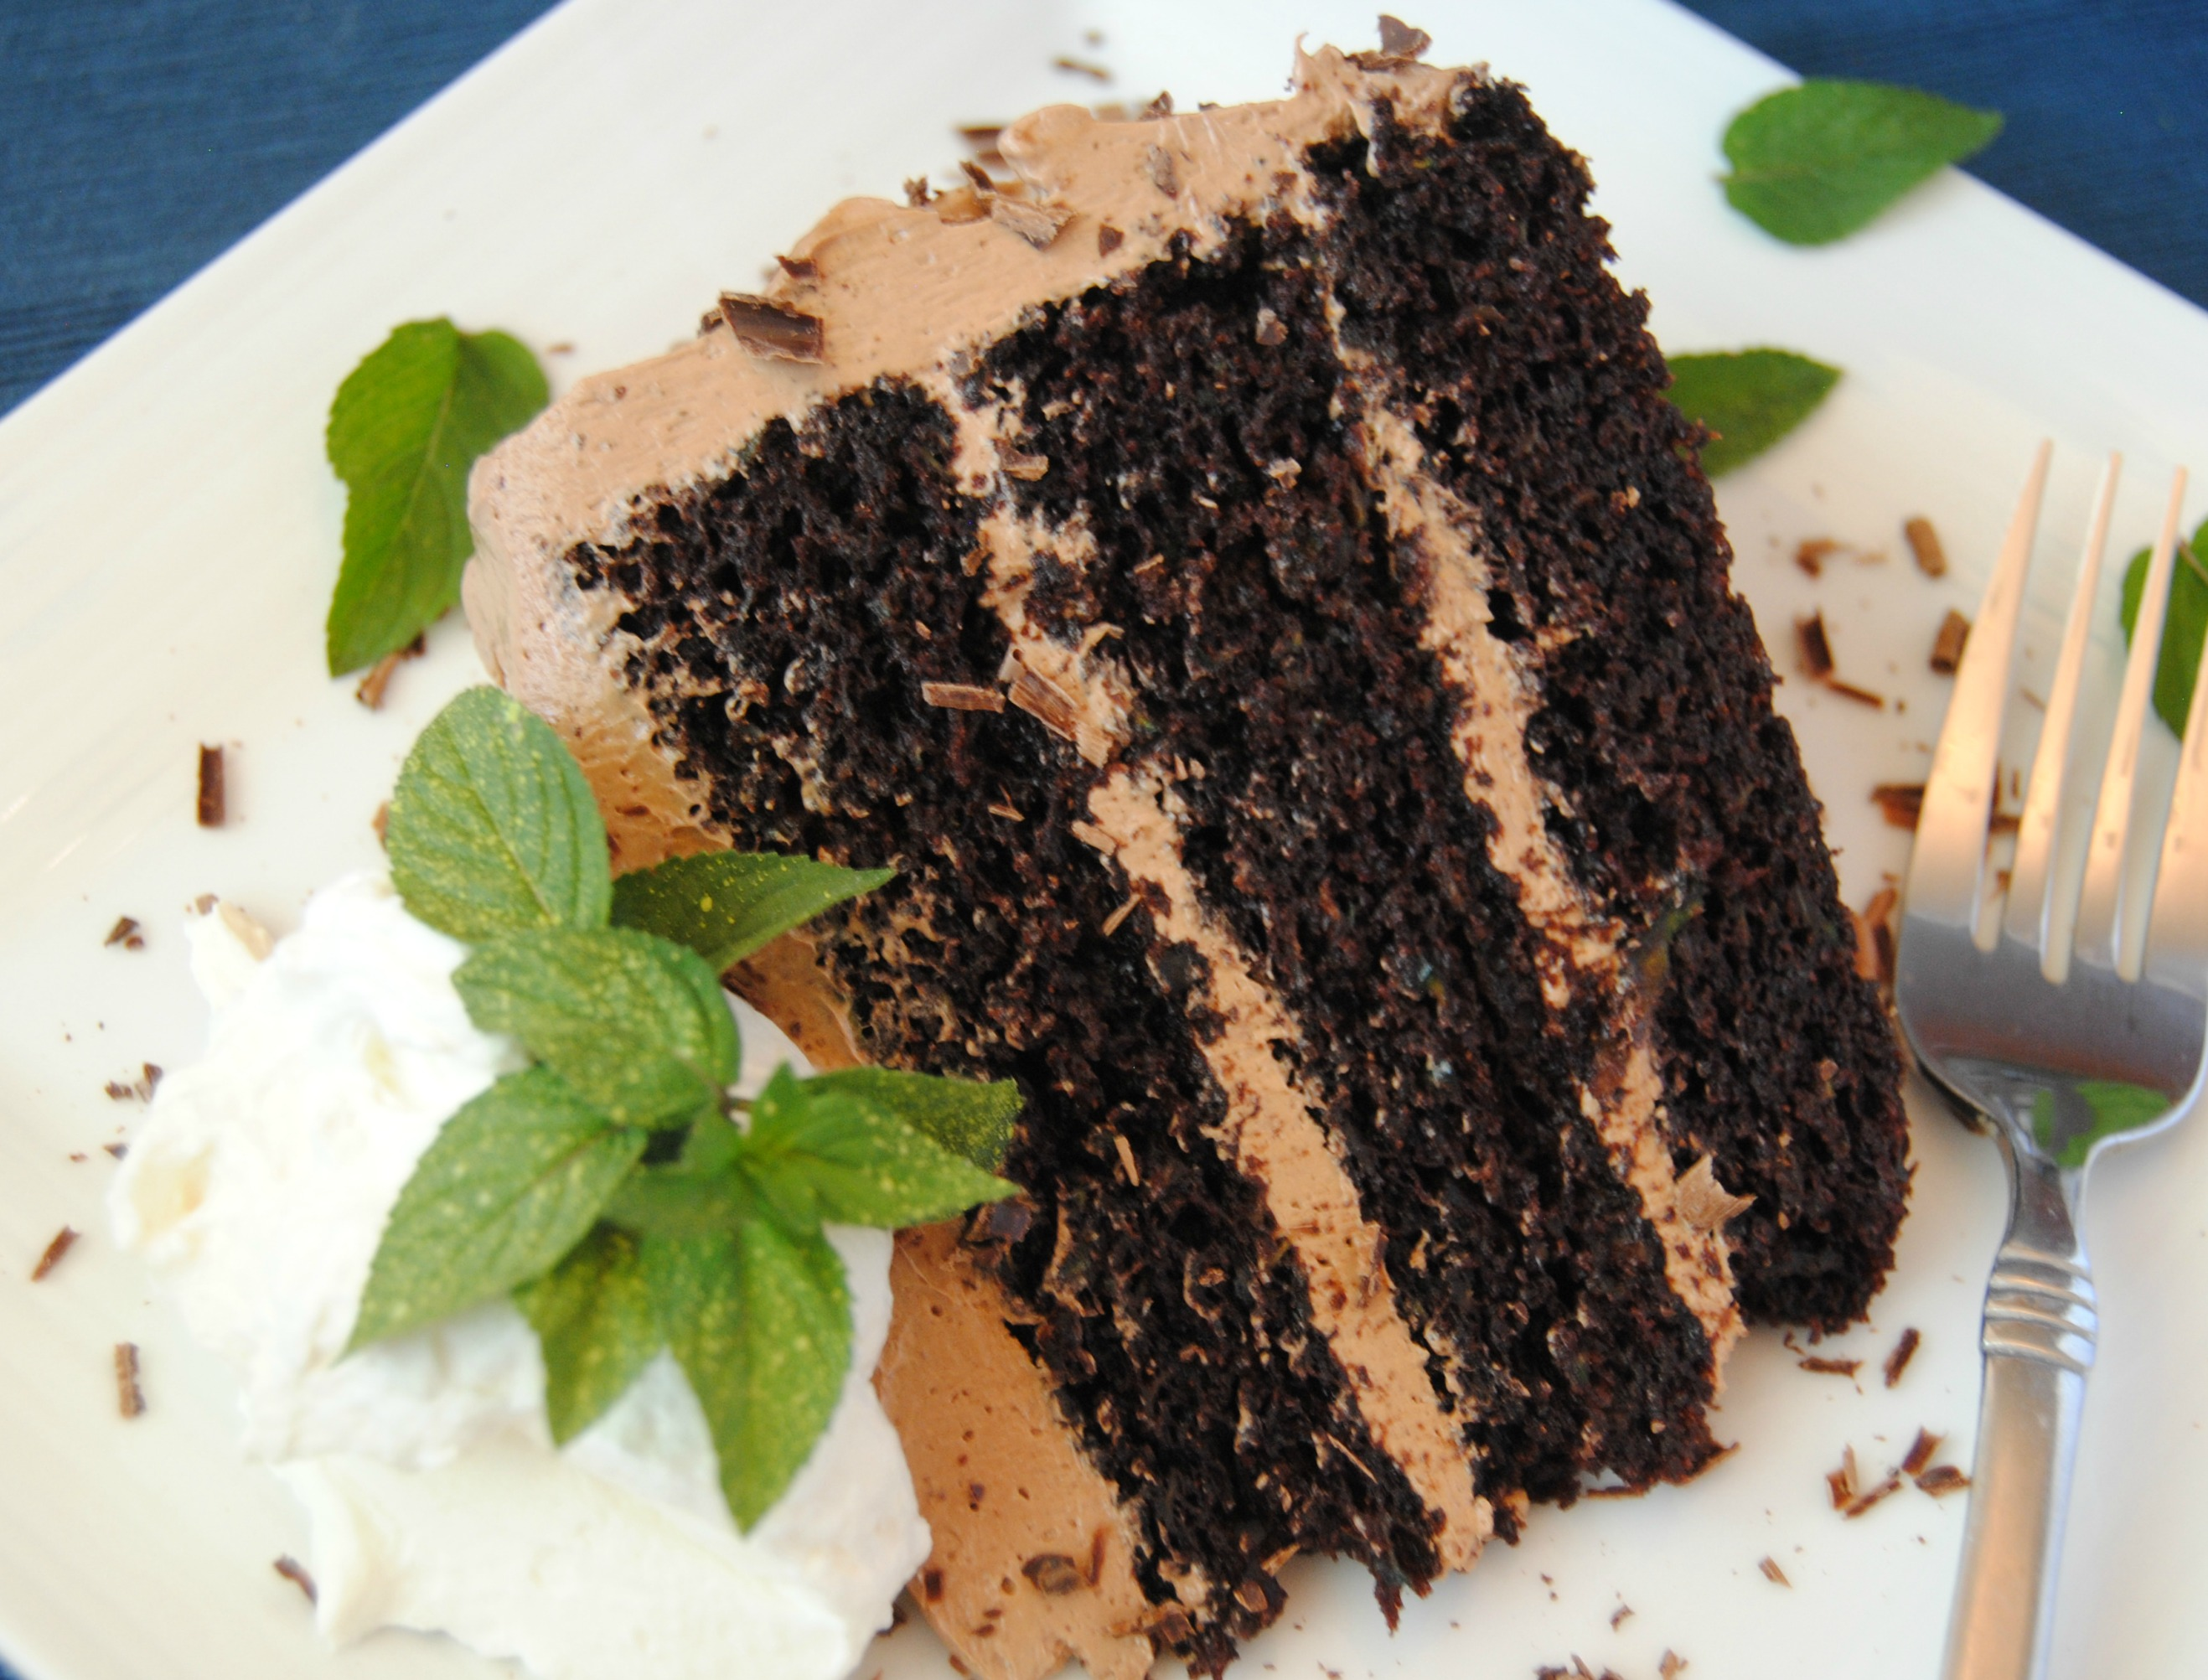 No Fail Chocolate Zucchini Cake - When's My Vacation